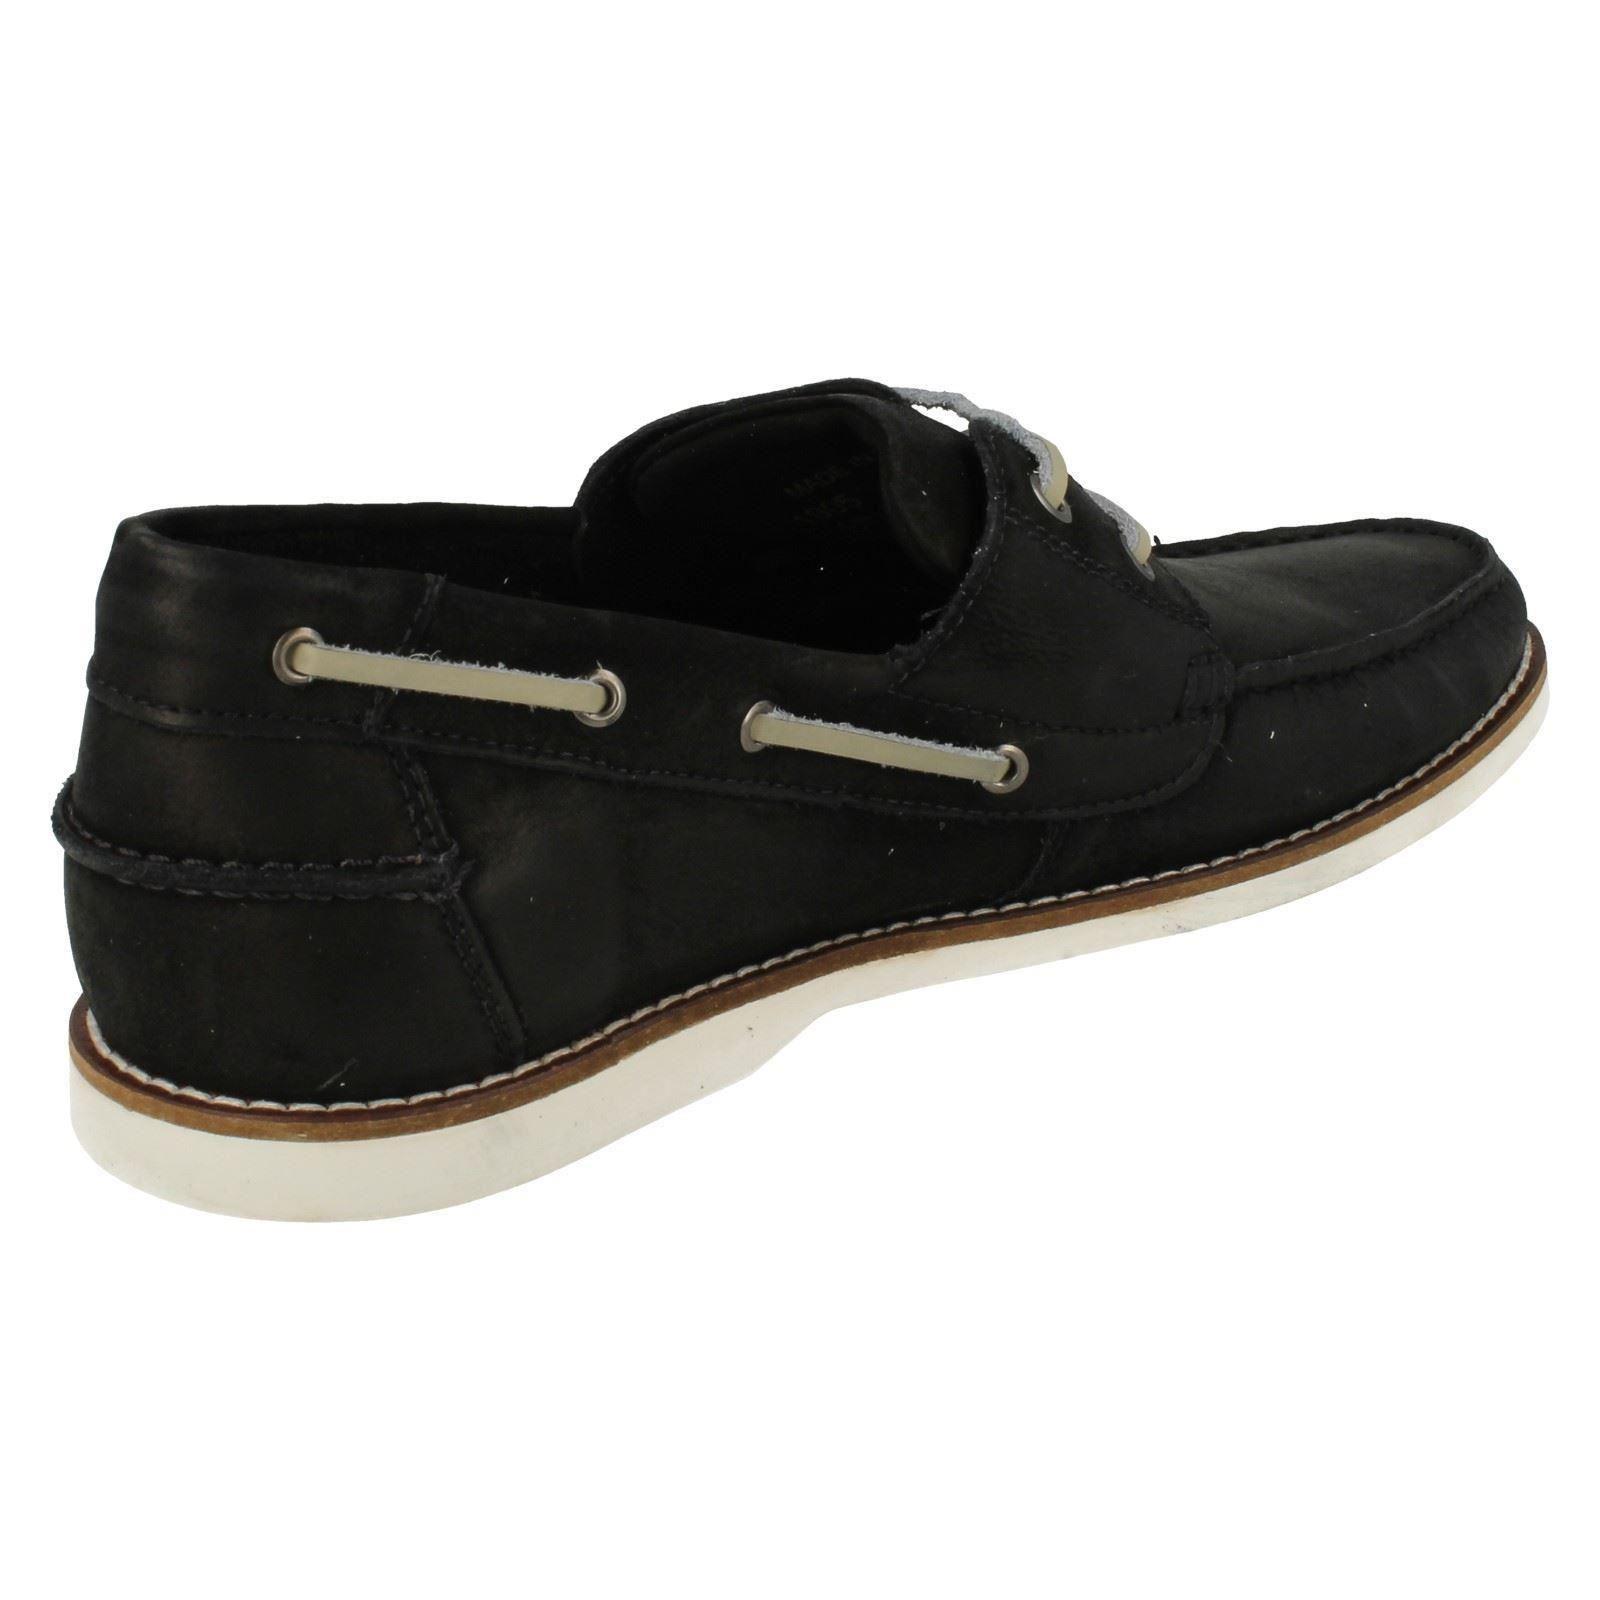 Men's Anatomic & Co Casual Yago Lace Up Deck Shoes Yago Casual 191905 Vintage 7d9773